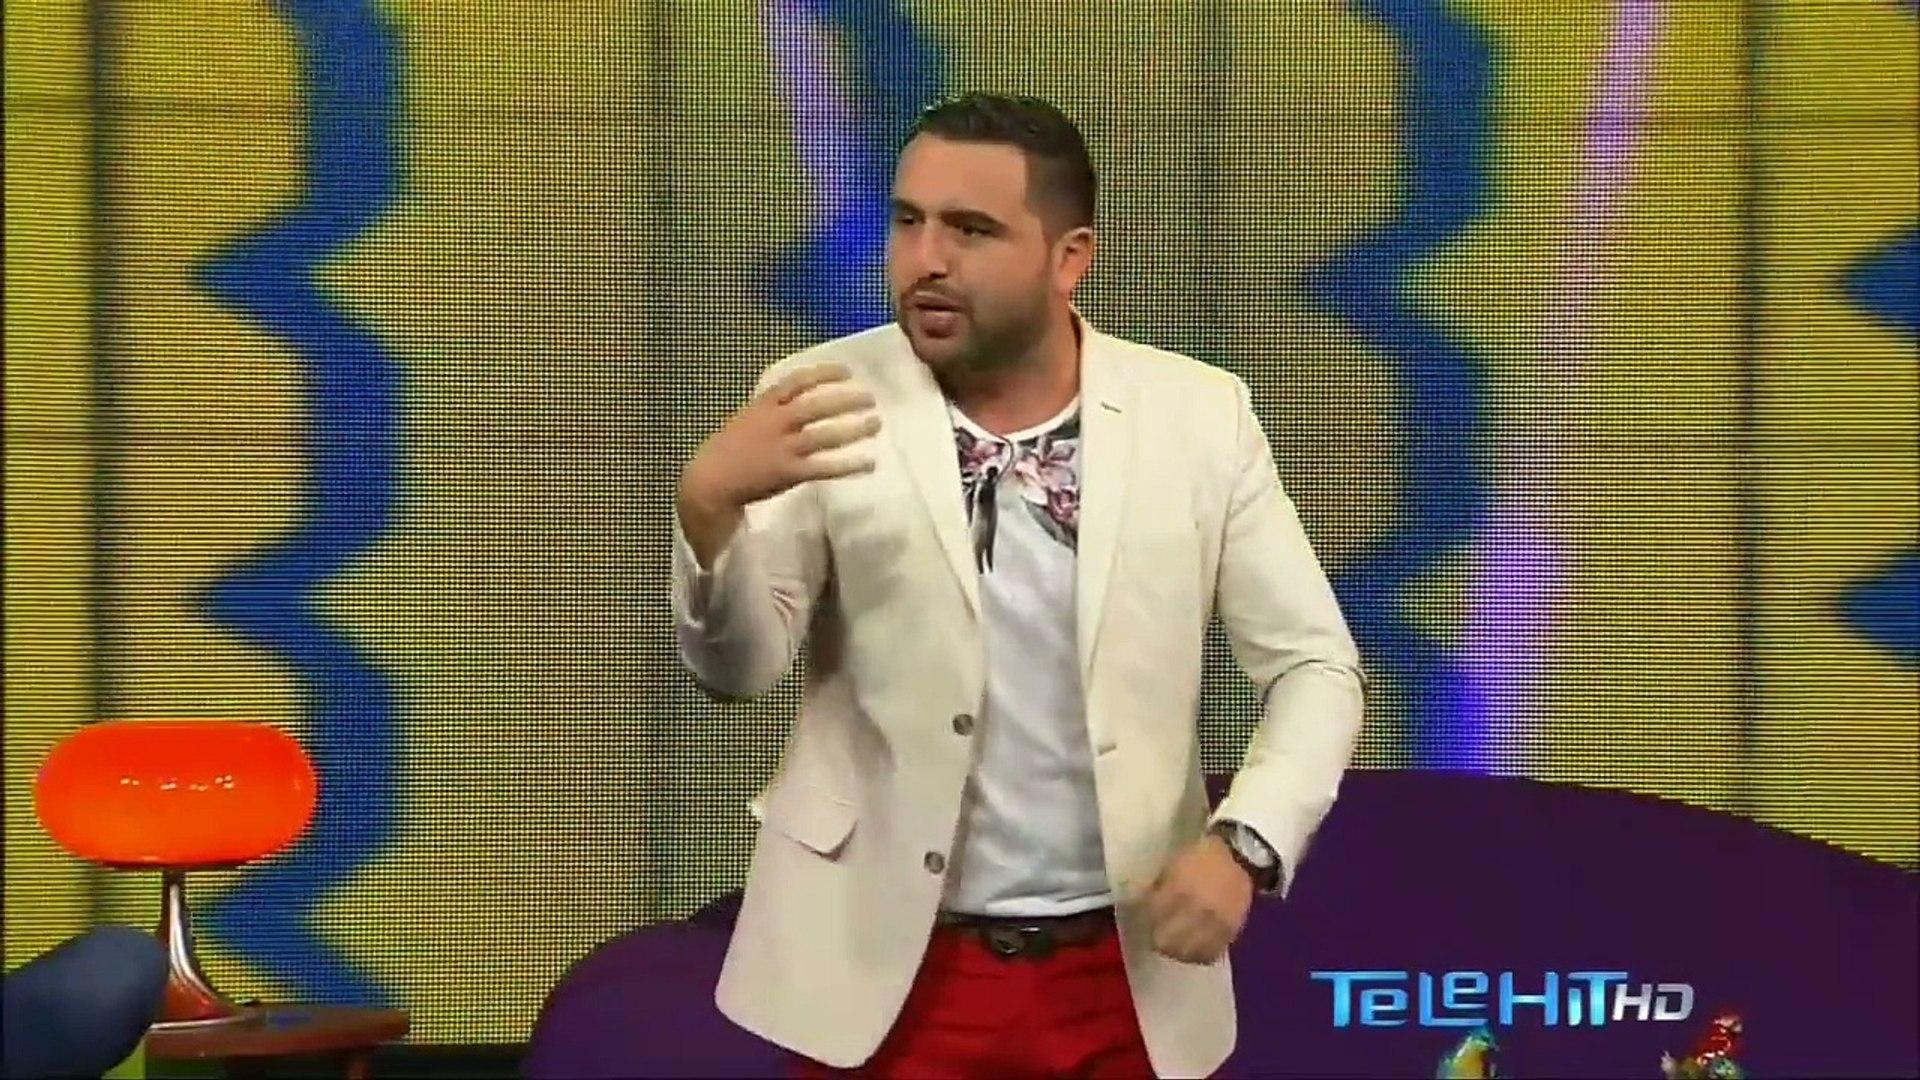 Especial De Comedia 3 Parte 1/2 2015 HD